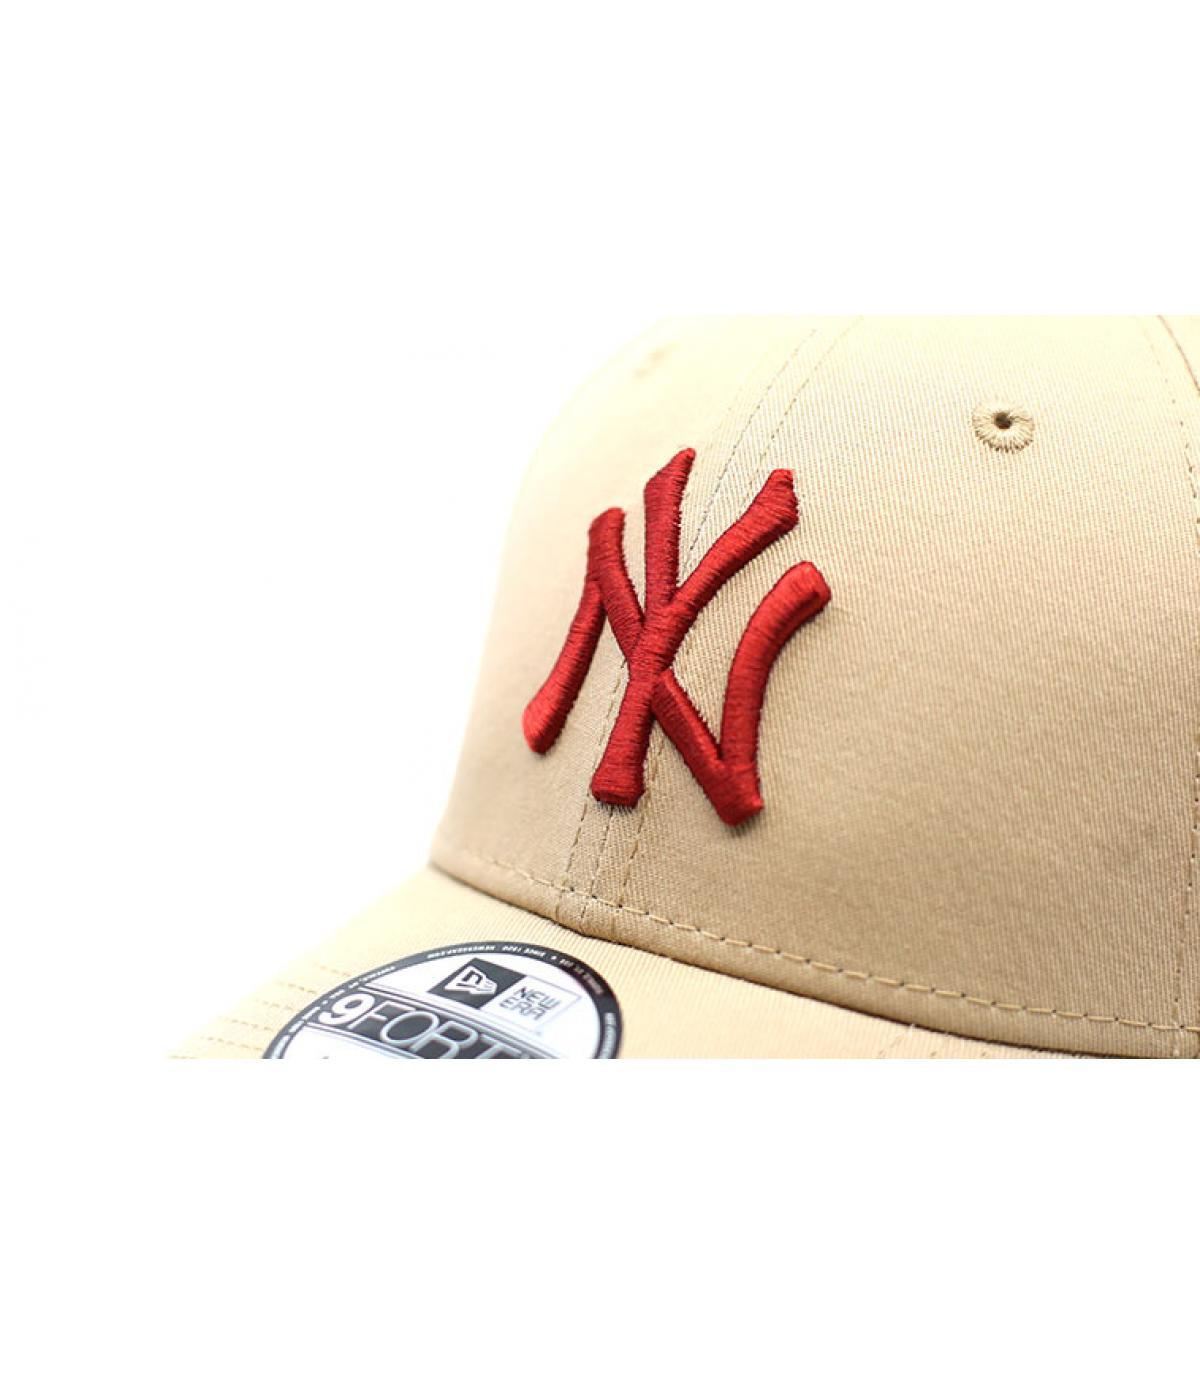 Details Cap League Ess NY 9Forty camel hot red - Abbildung 3